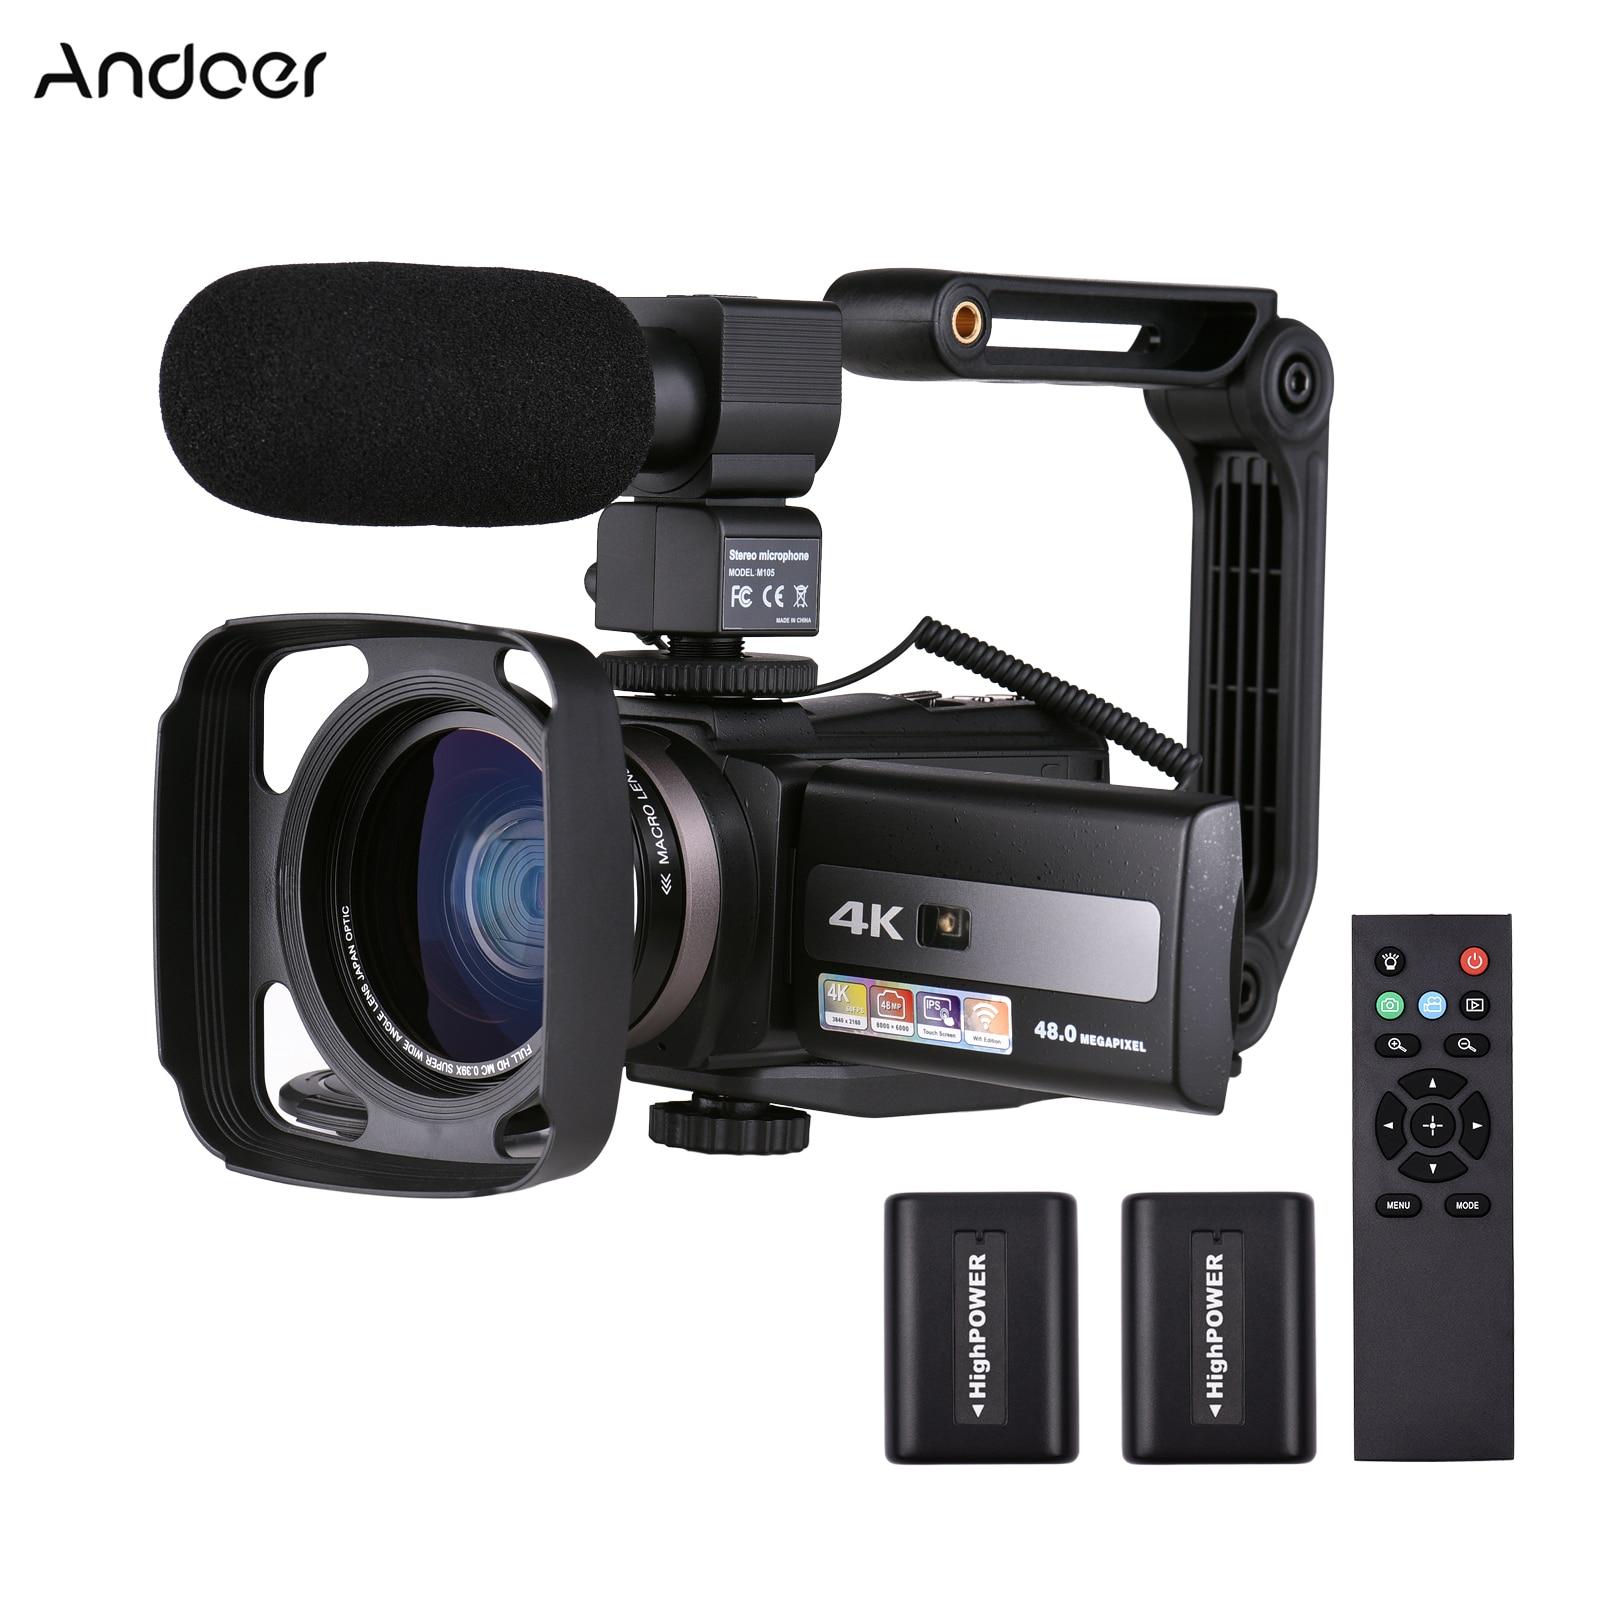 Andoer 4K 60FPS الترا HD كاميرا فيديو رقمية كاميرا فيديو DV 48MP 16X التكبير 3 بوصة تدوير LCD تعمل باللمس واي فاي الأشعة تحت الحمراء للرؤية الليلية